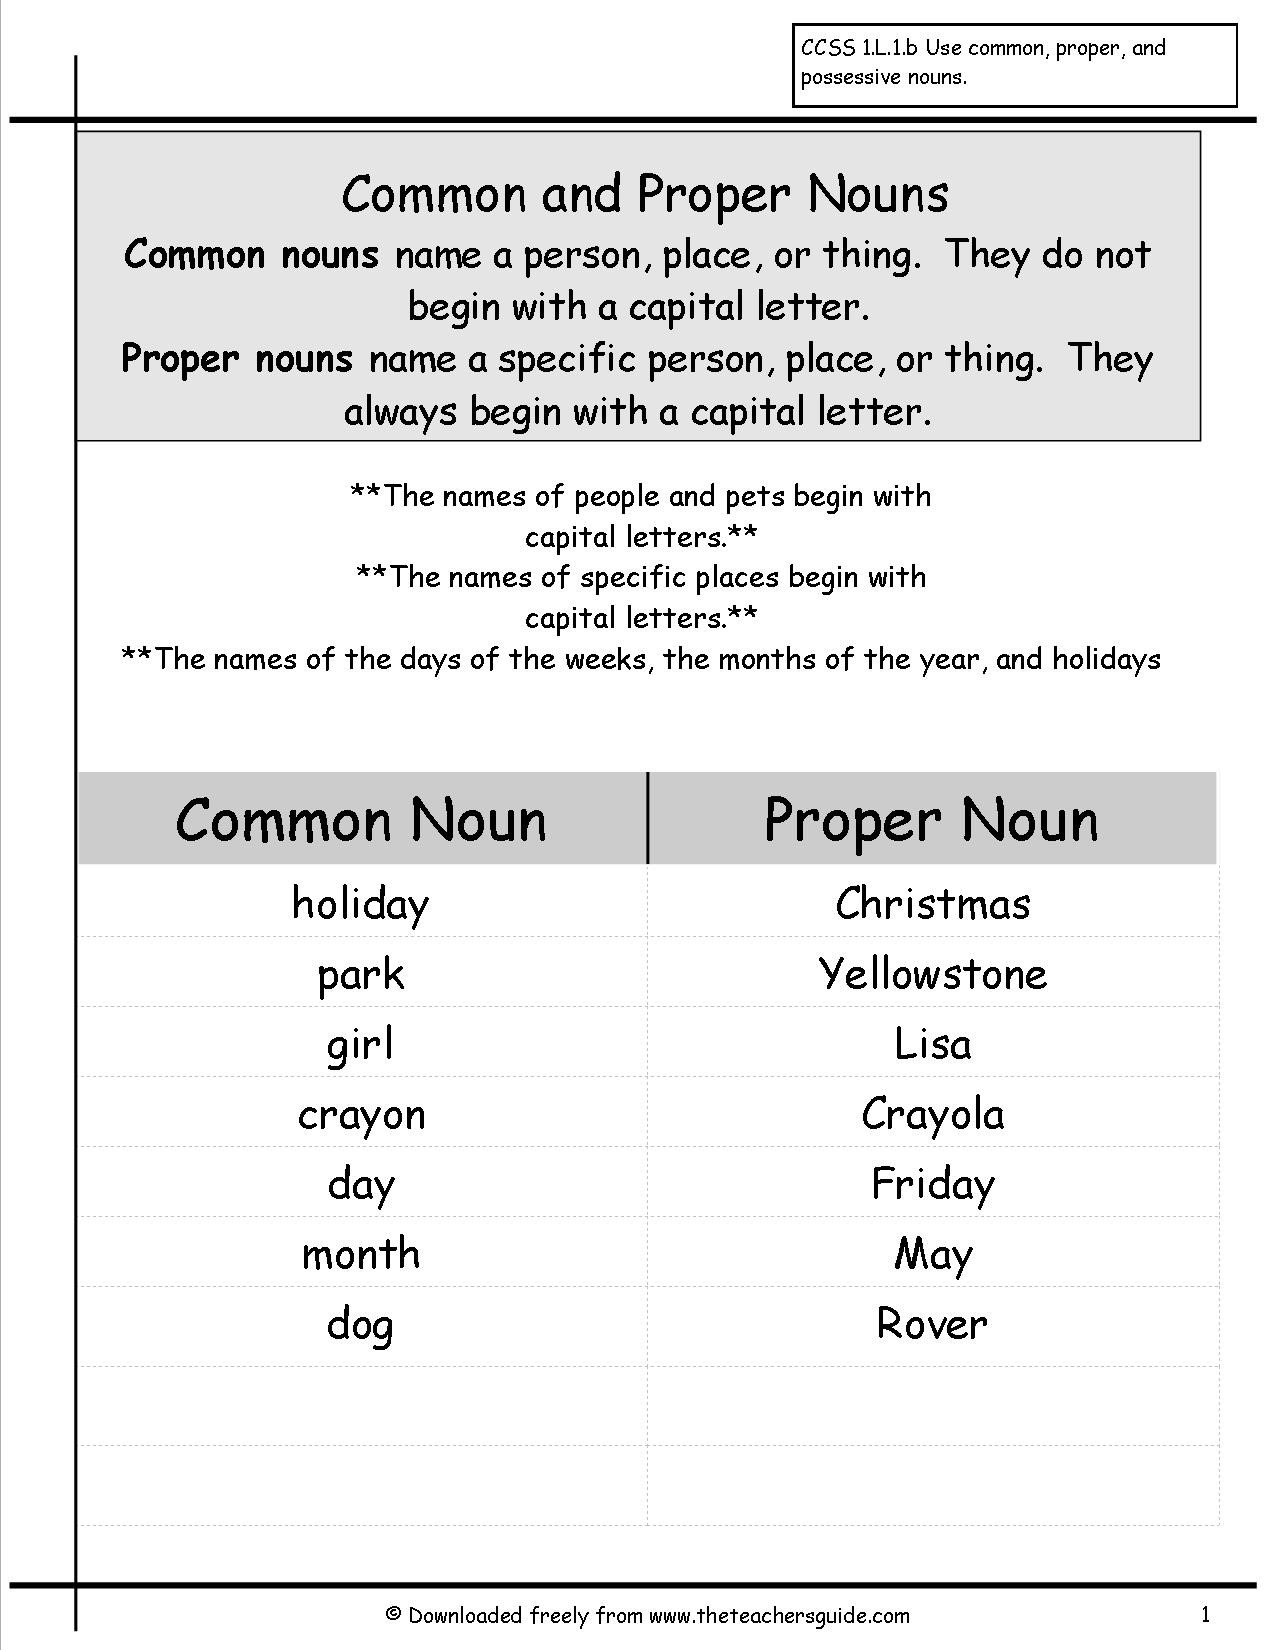 Proper Nouns Worksheet 2nd Grade Mon Noun and Proper Noun Worksheet for Grade 4